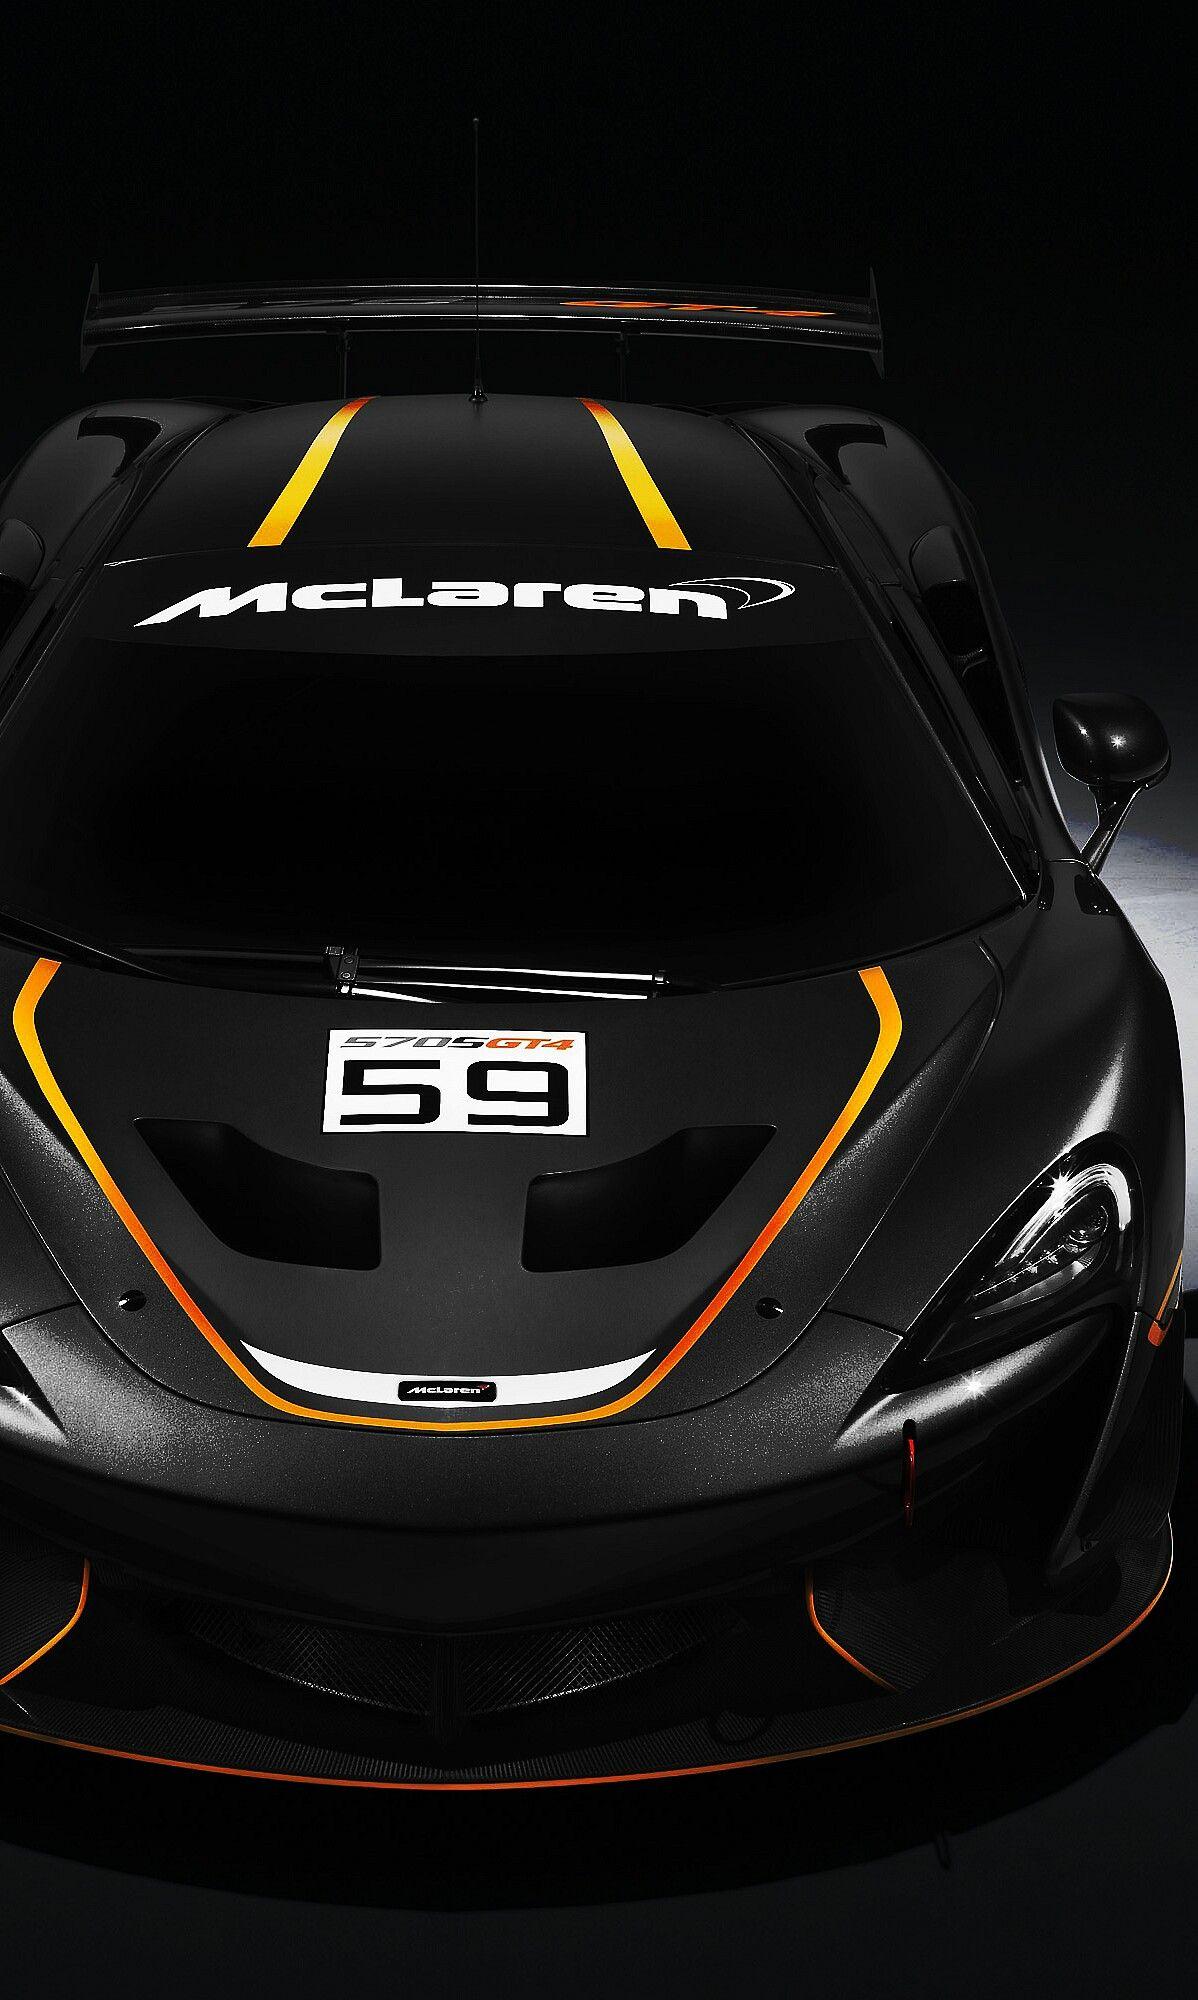 2016 Mclaren 570s Gt4 Top Sports Cars Cars Super Cars